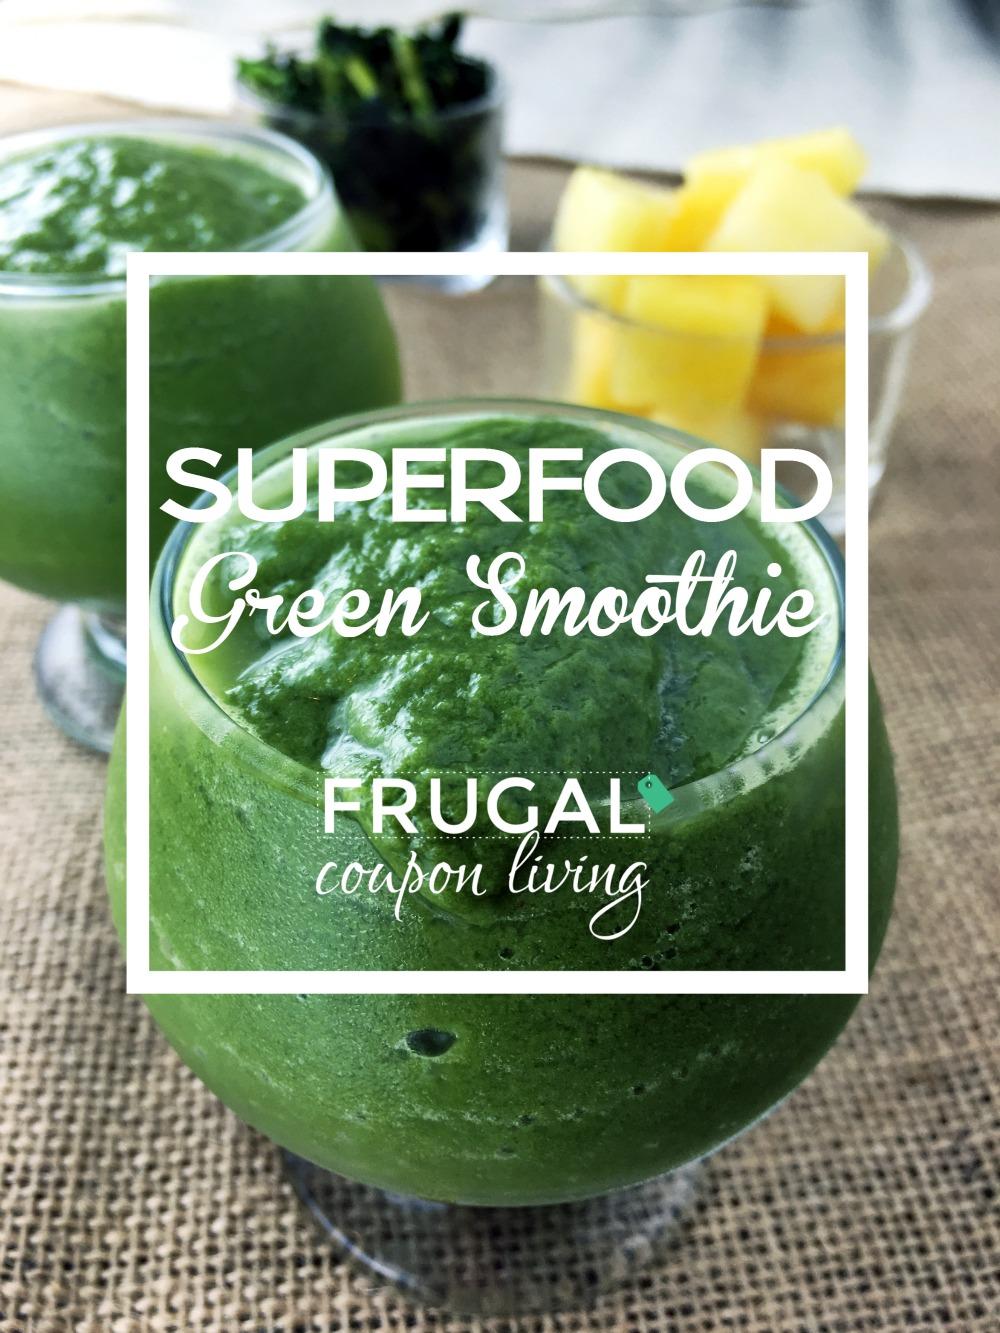 Superfood-green-Smoothie-frugal-coupon-living-framed